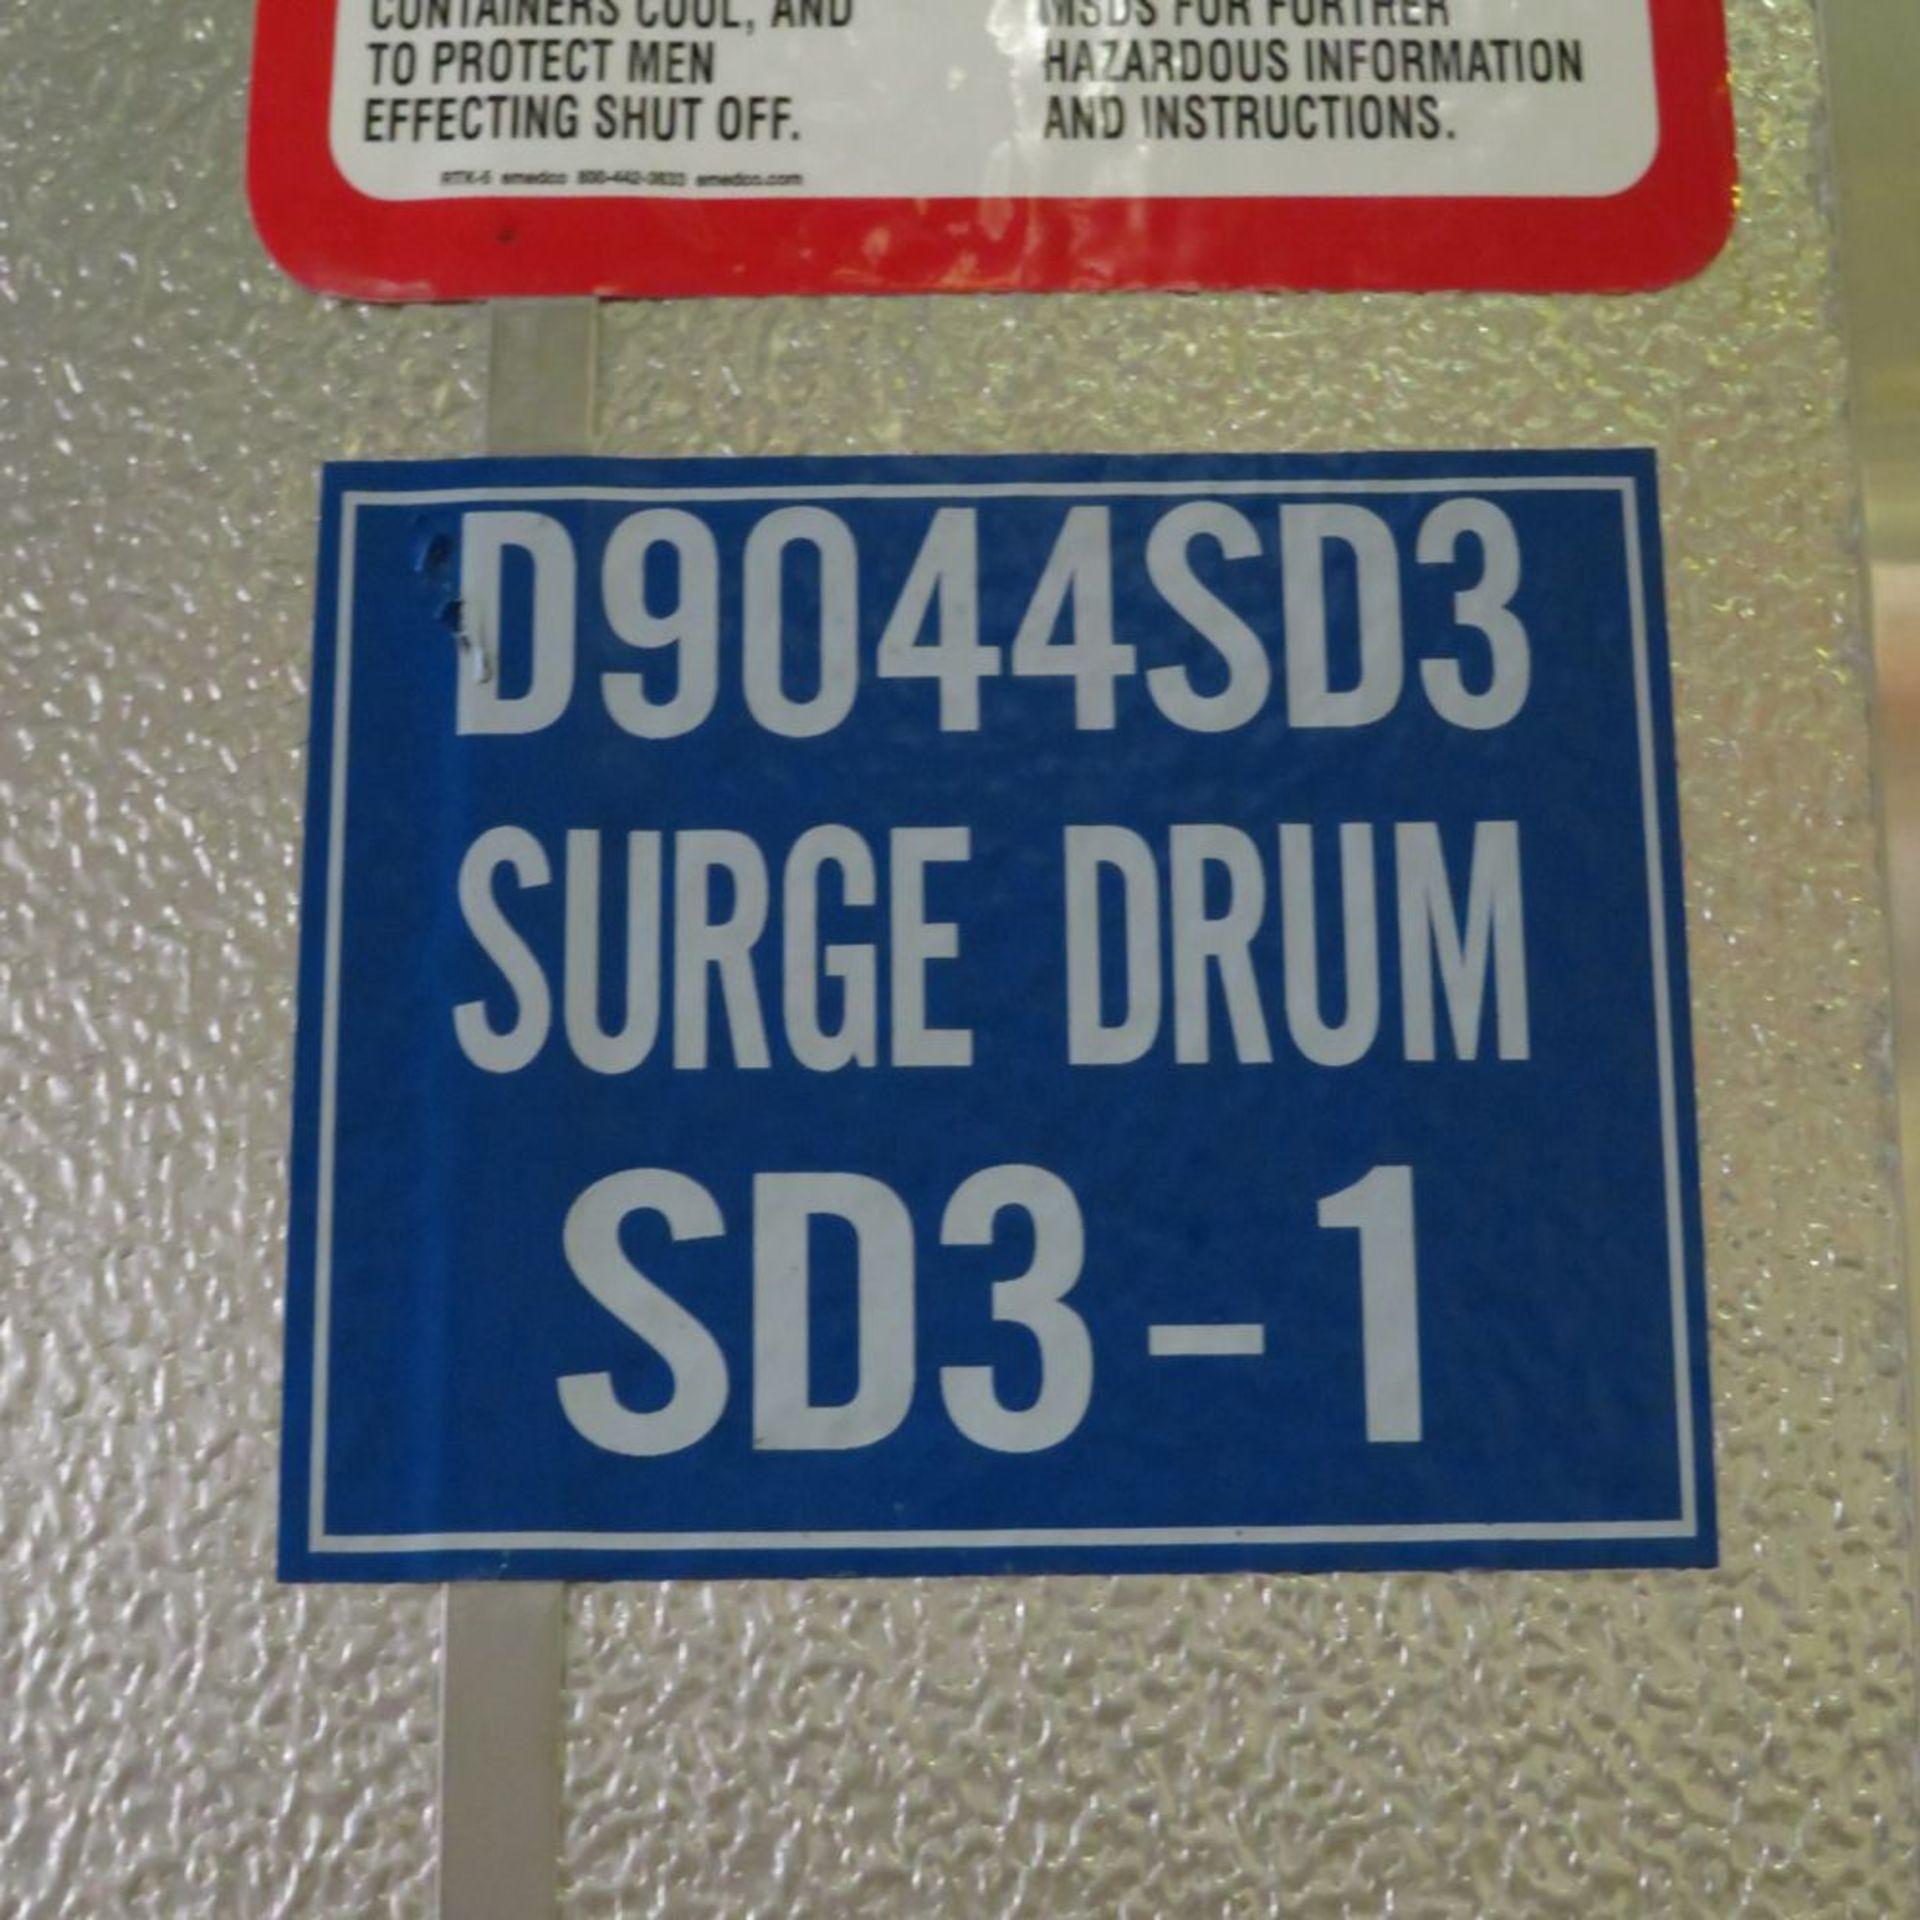 (2008) RVS Ammonia Surge Drum, SD 3-1 w/ - Image 2 of 4